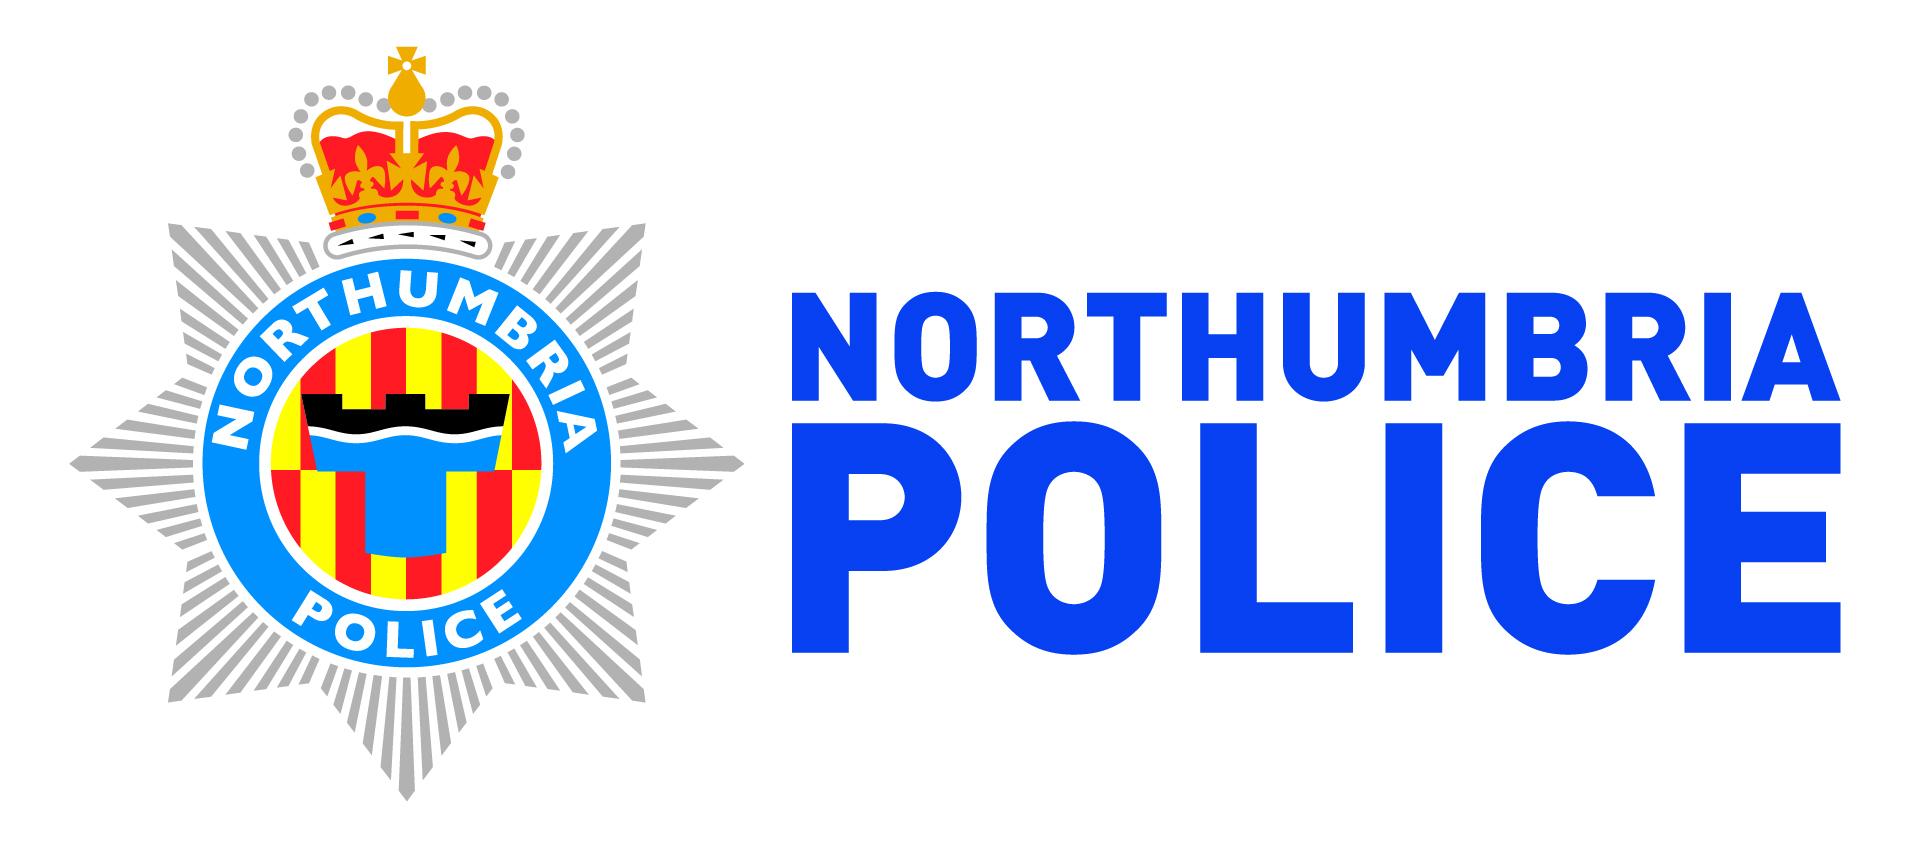 Northumbria Police.jpg